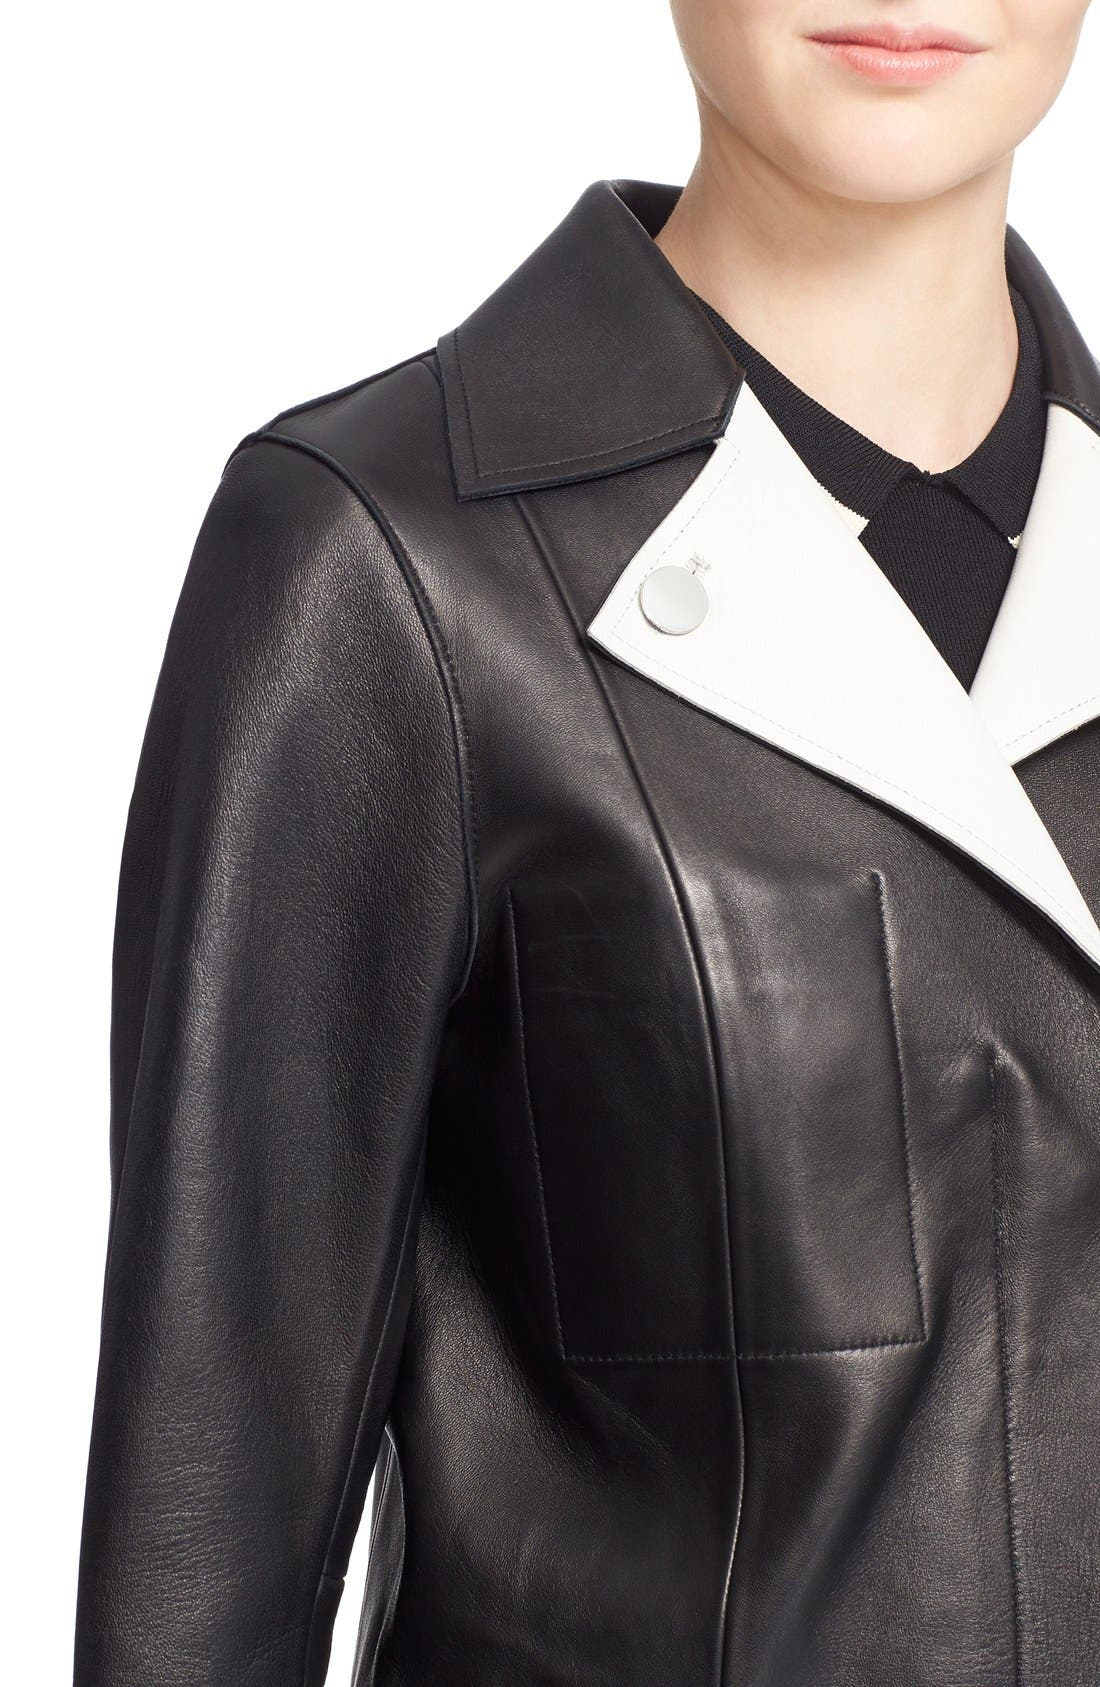 GREY Jason Wu Lambskin Leather Jacket,                             Alternate thumbnail 2, color,                             015